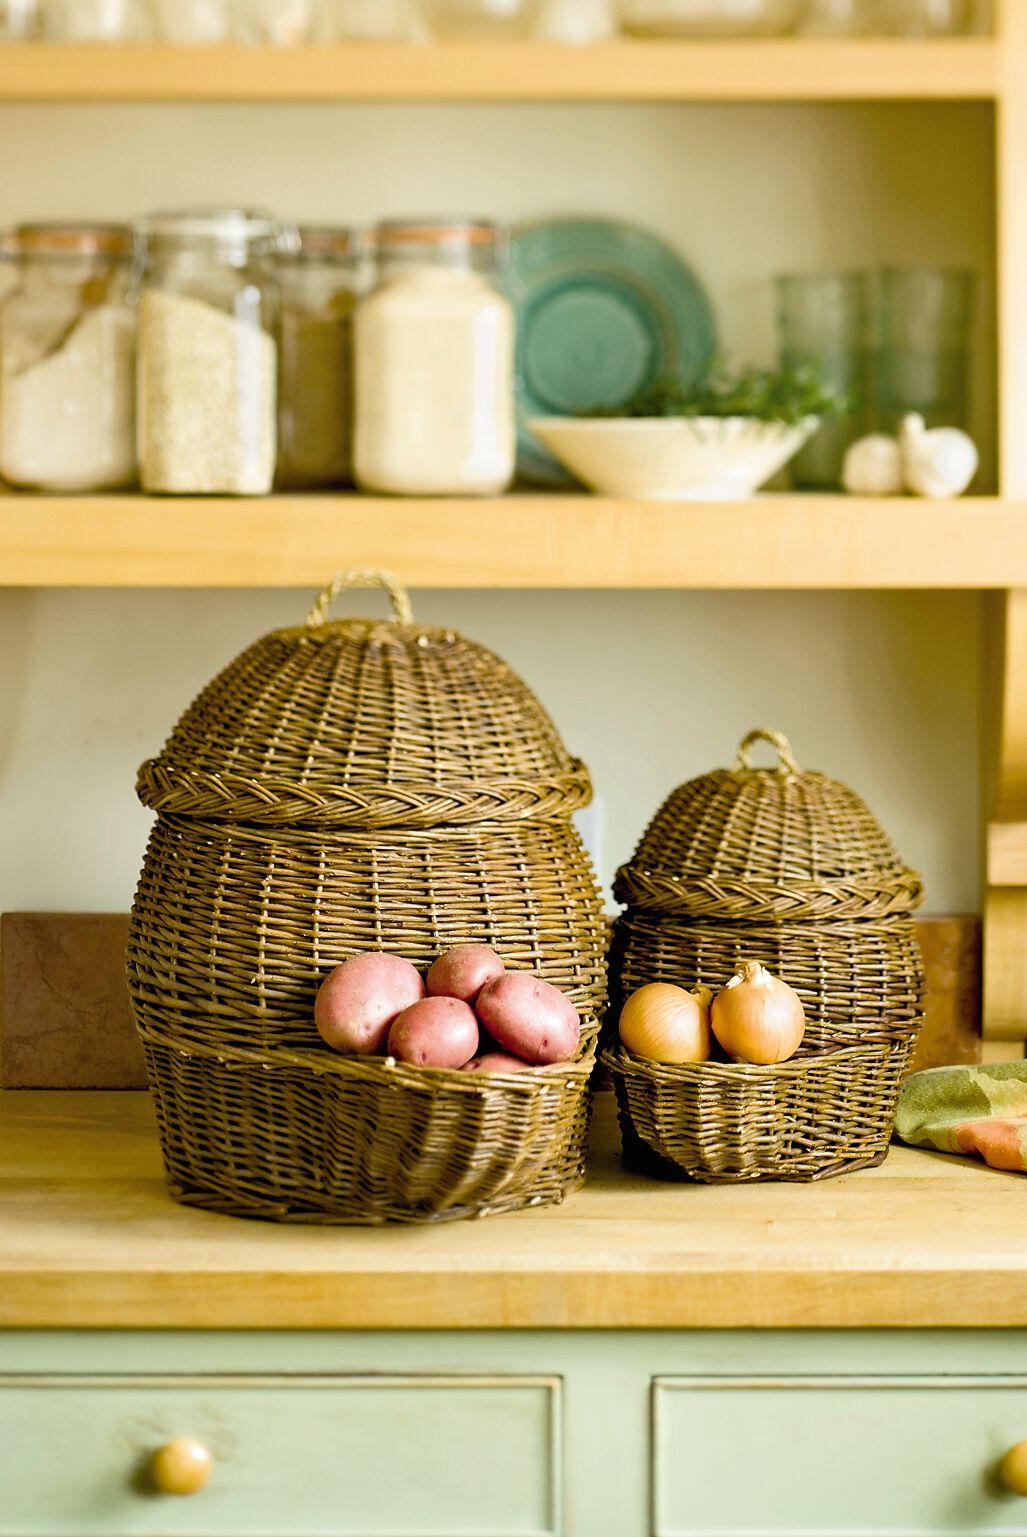 Onion & Potato Storage Baskets